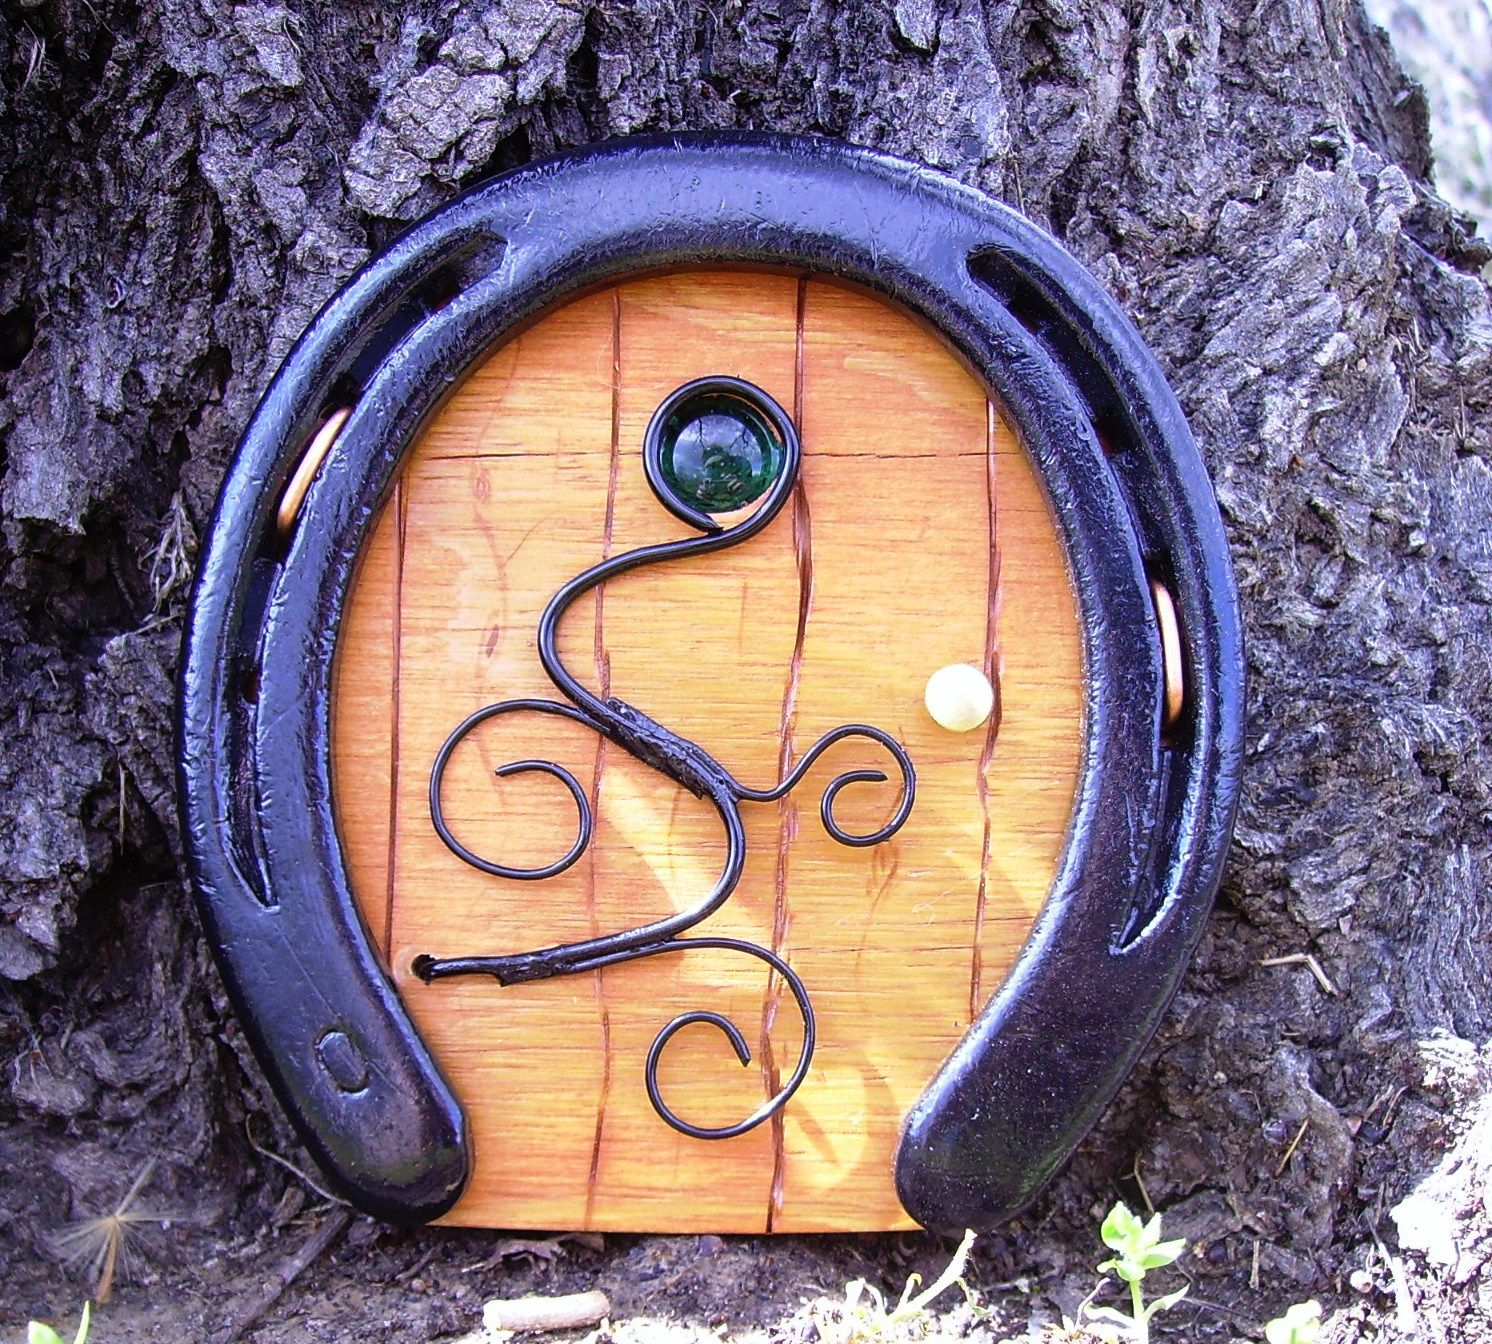 Horseshoe fairy / troll / hobbit door with copper wire scroll